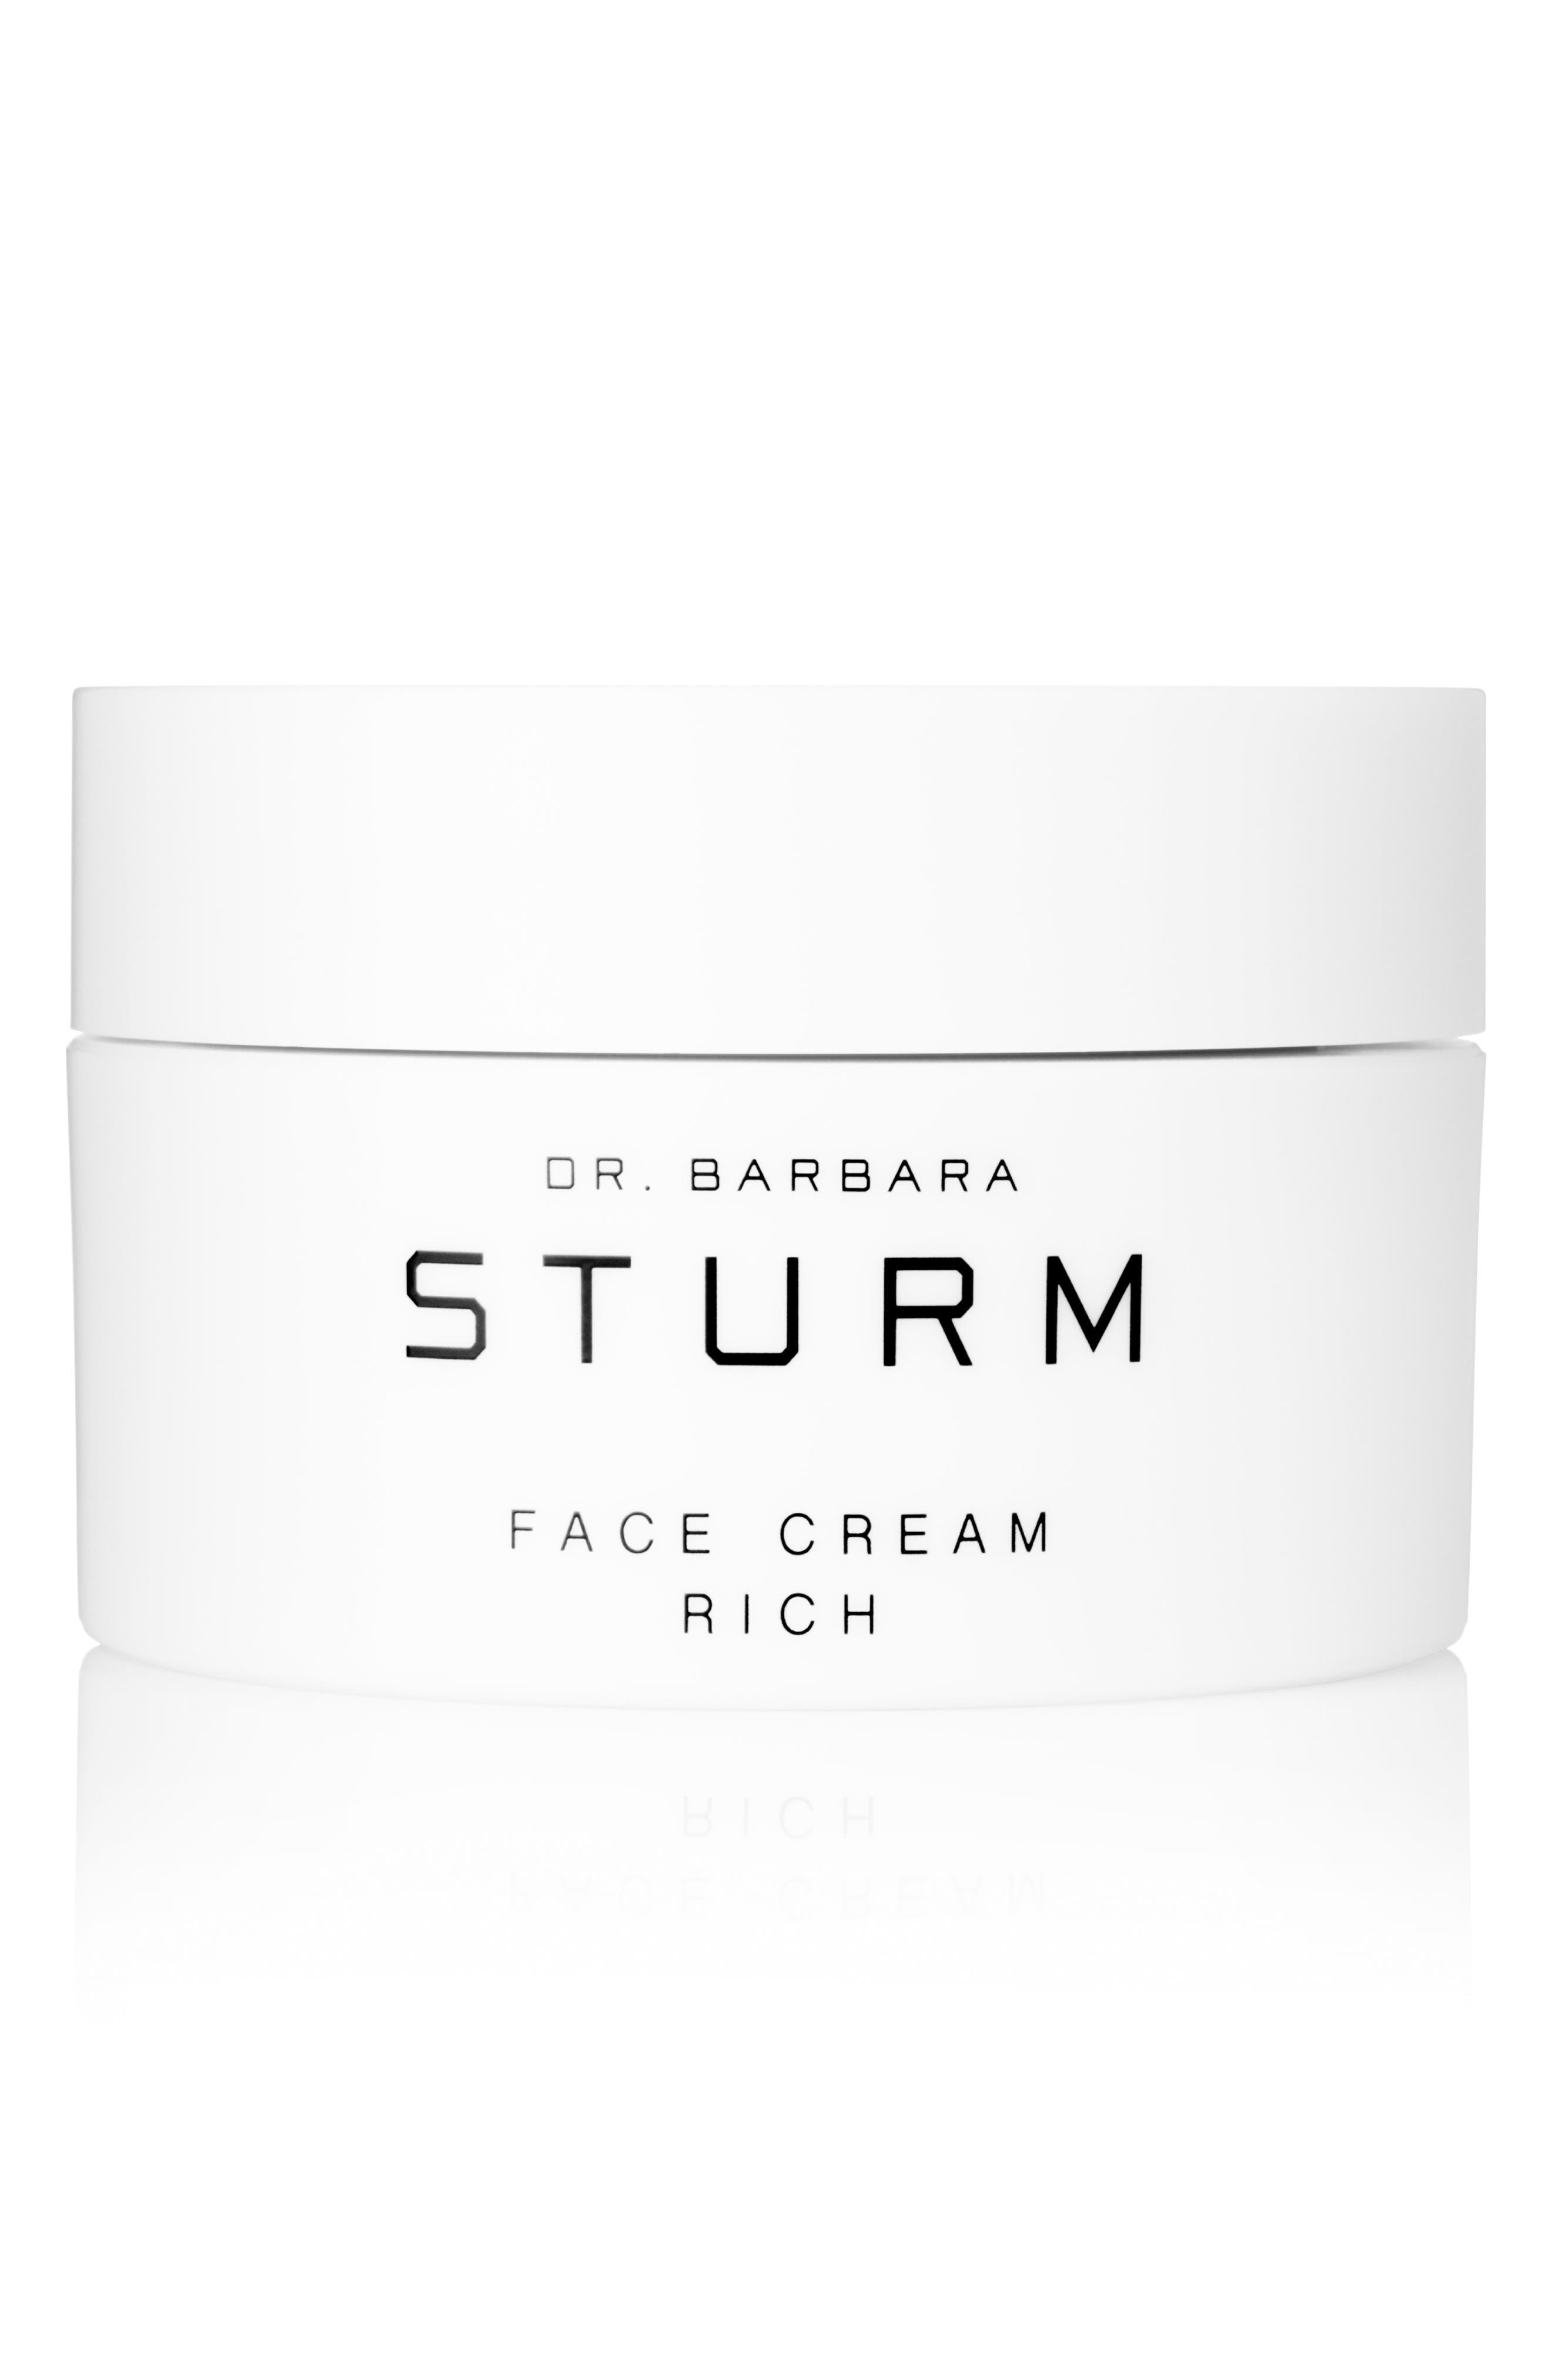 Alternate Image 1 Selected - Dr. Barbara Sturm Face Cream Rich for Women